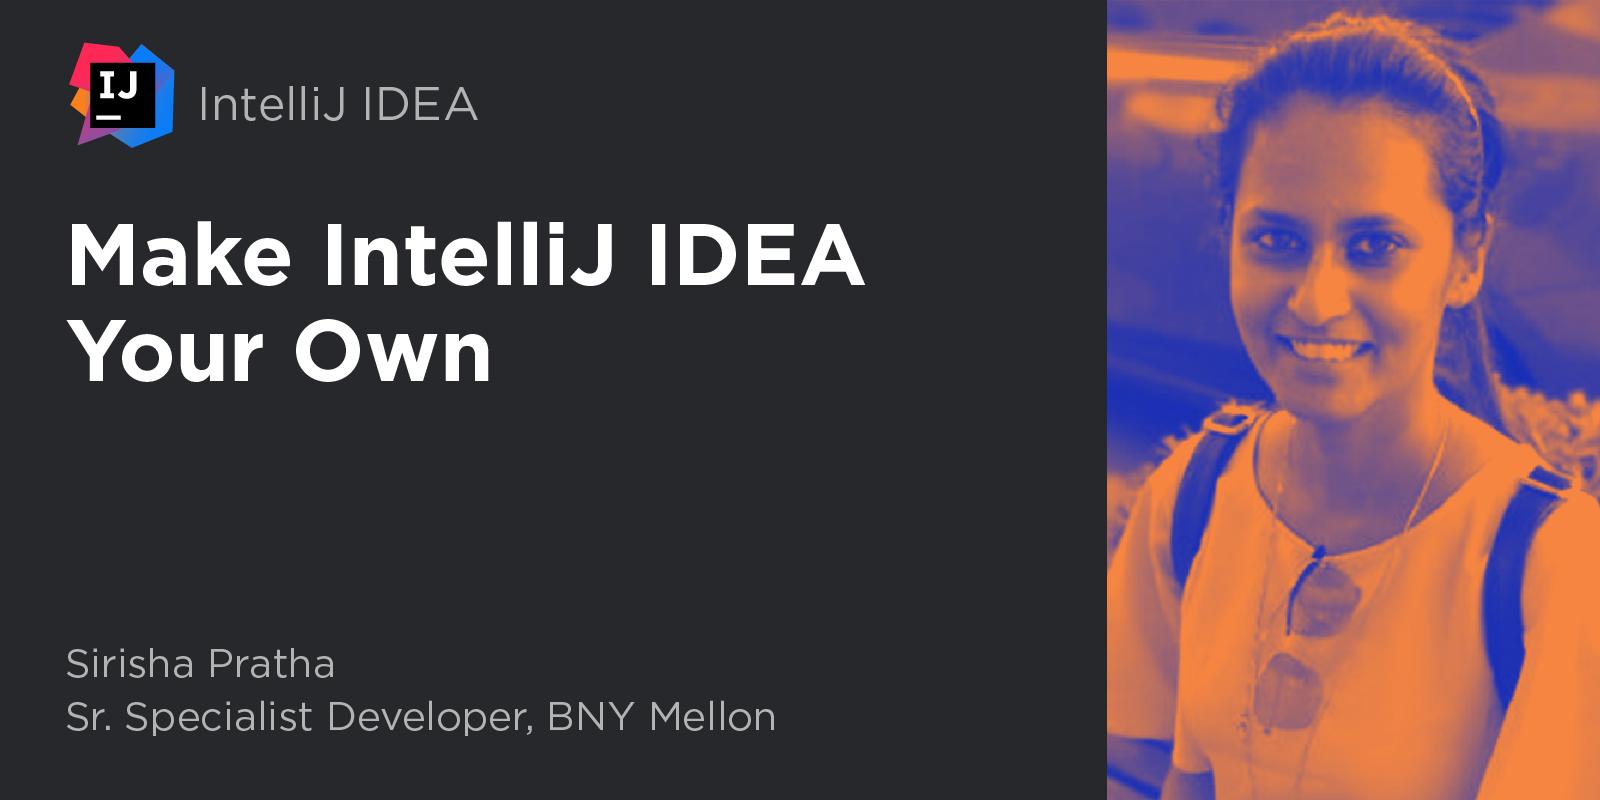 Make IntelliJ IDEA Your Own